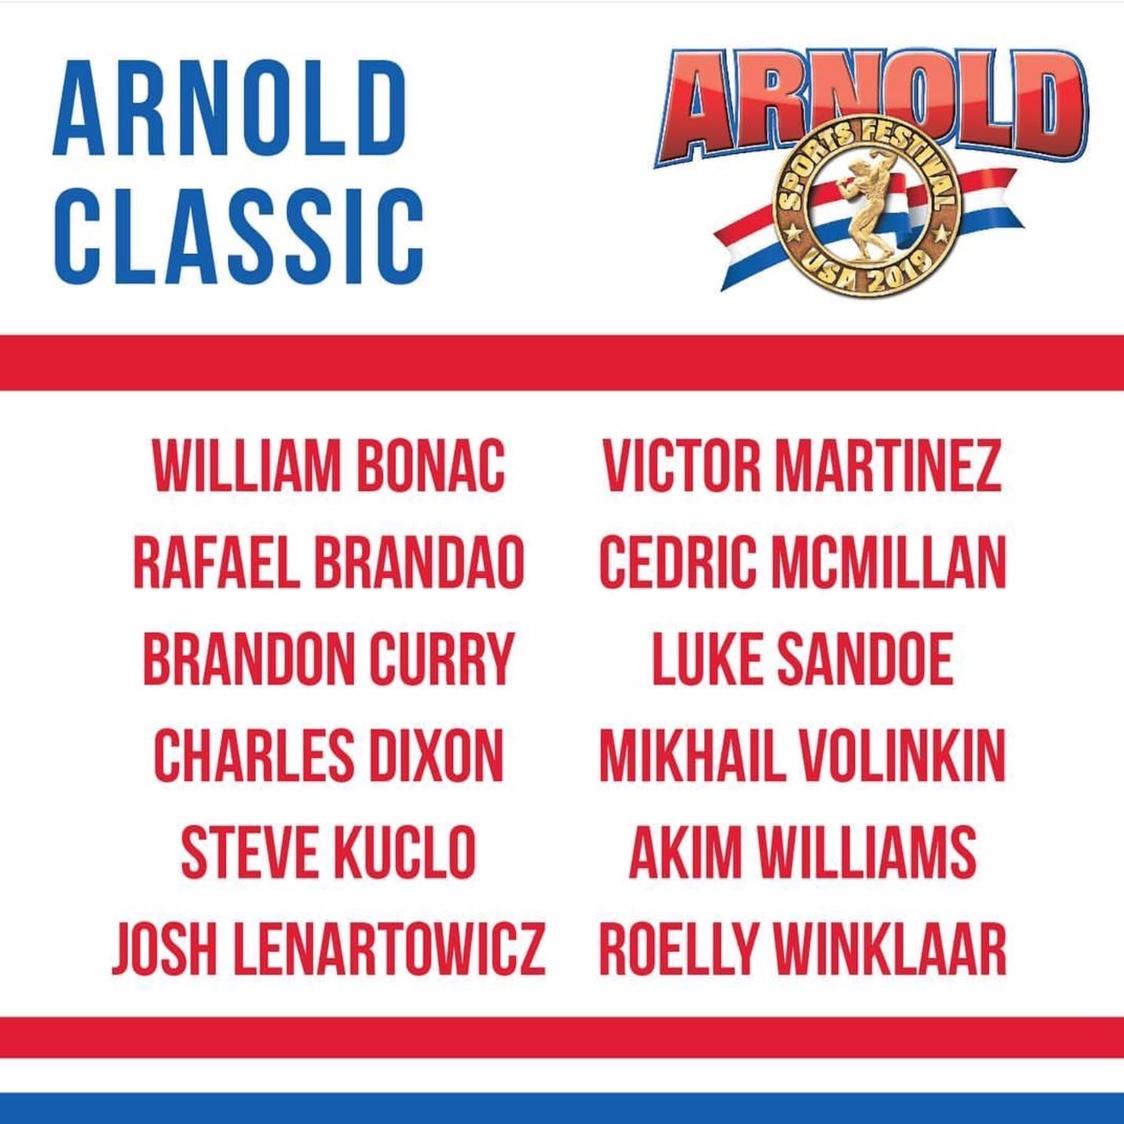 2019 Arnold Classic USA!! 731fae5e590dc577e339377125da3c94